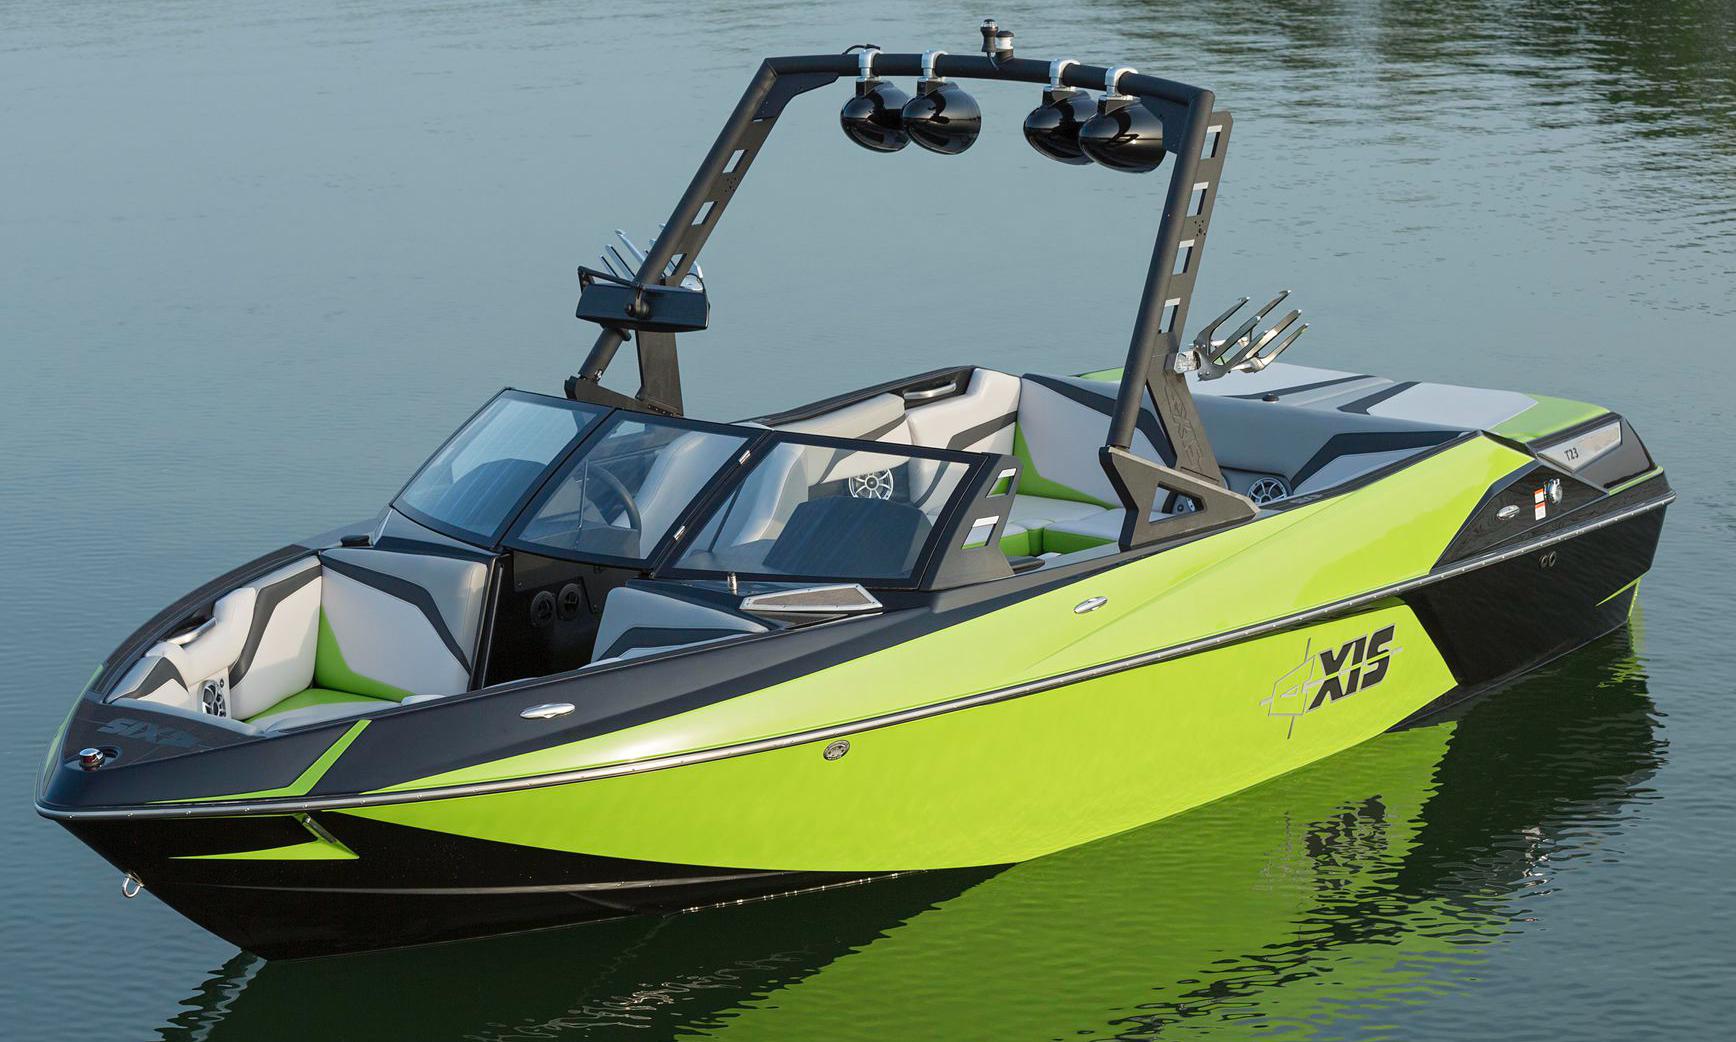 Wakeboard Boat In 2020 Wakeboard Boats Malibu Boats Boat